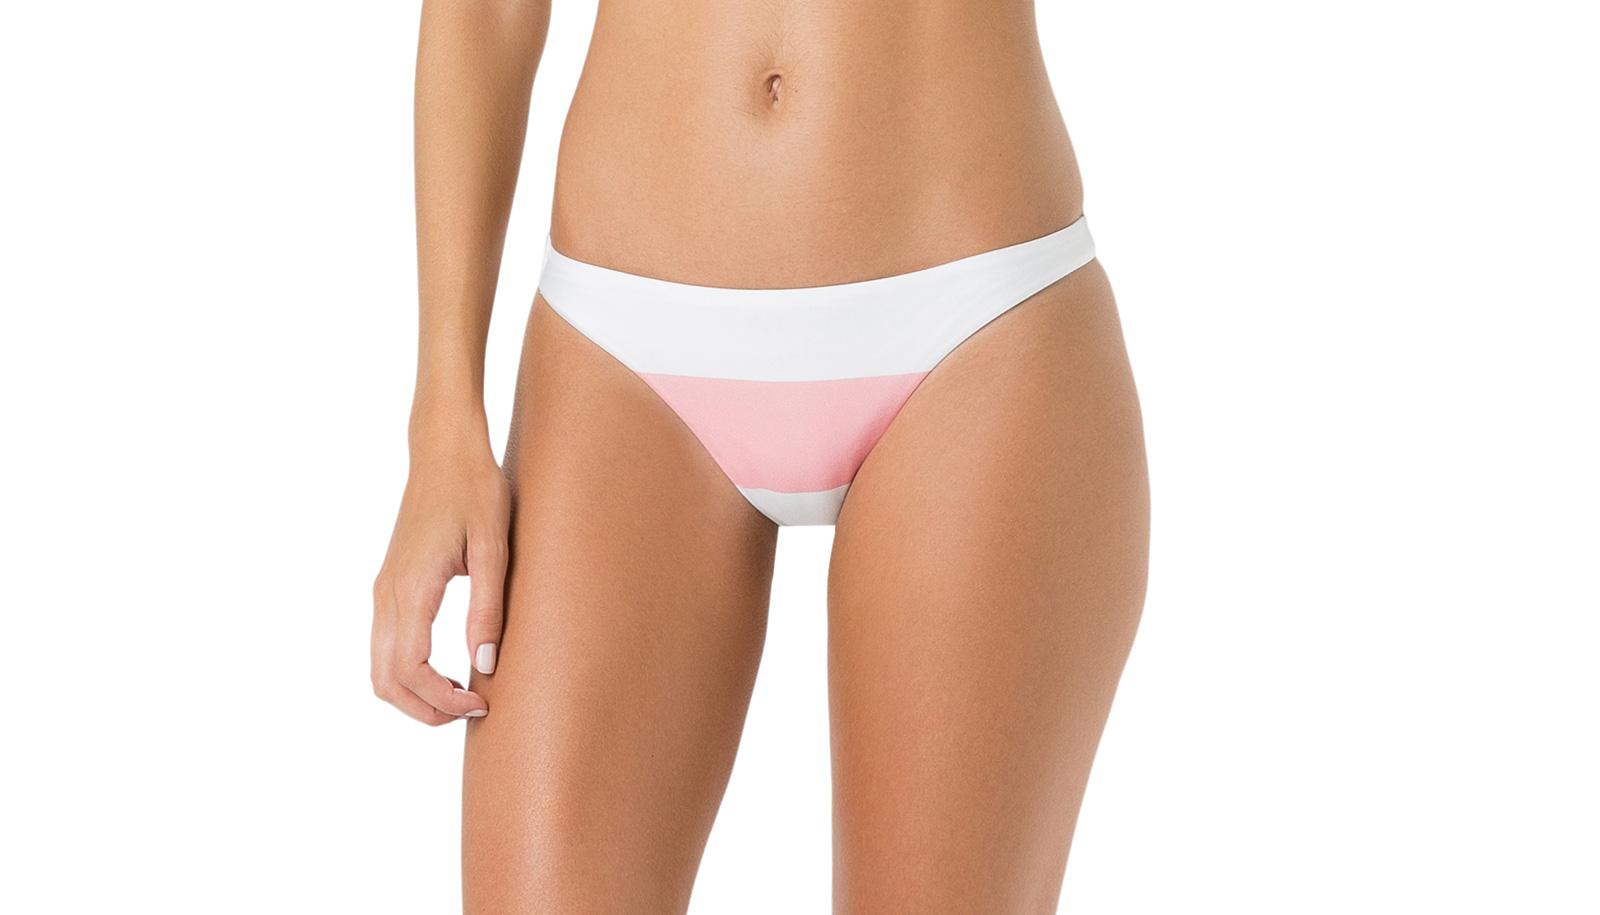 14ec5bedf7 Bikini Bottoms White And Pink Bikini Briefs - Bottom Miracle Club